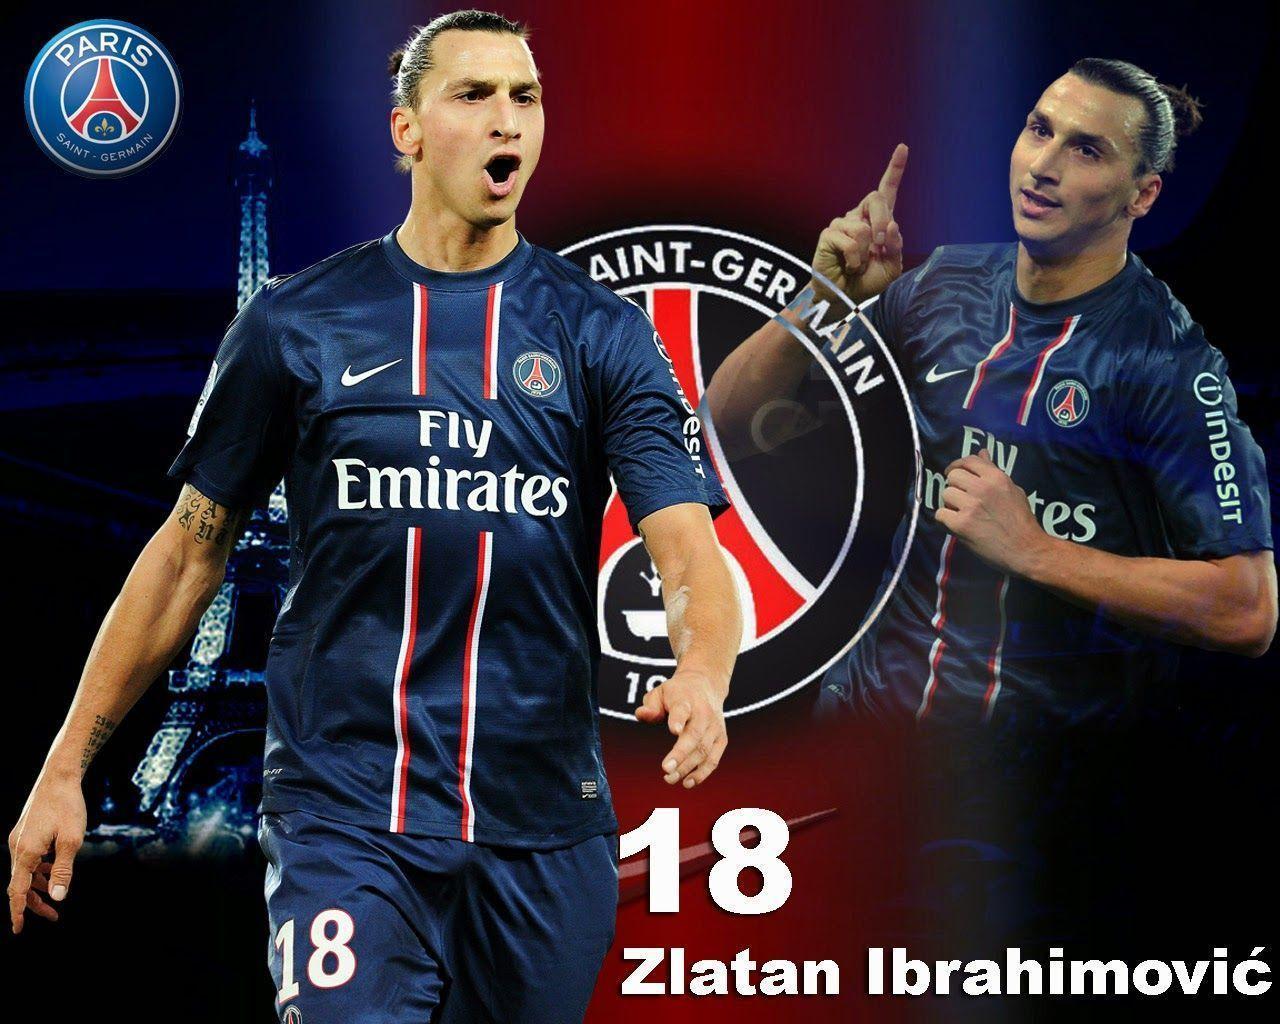 Zlatan Ibrahimovic PSG Wallpaper